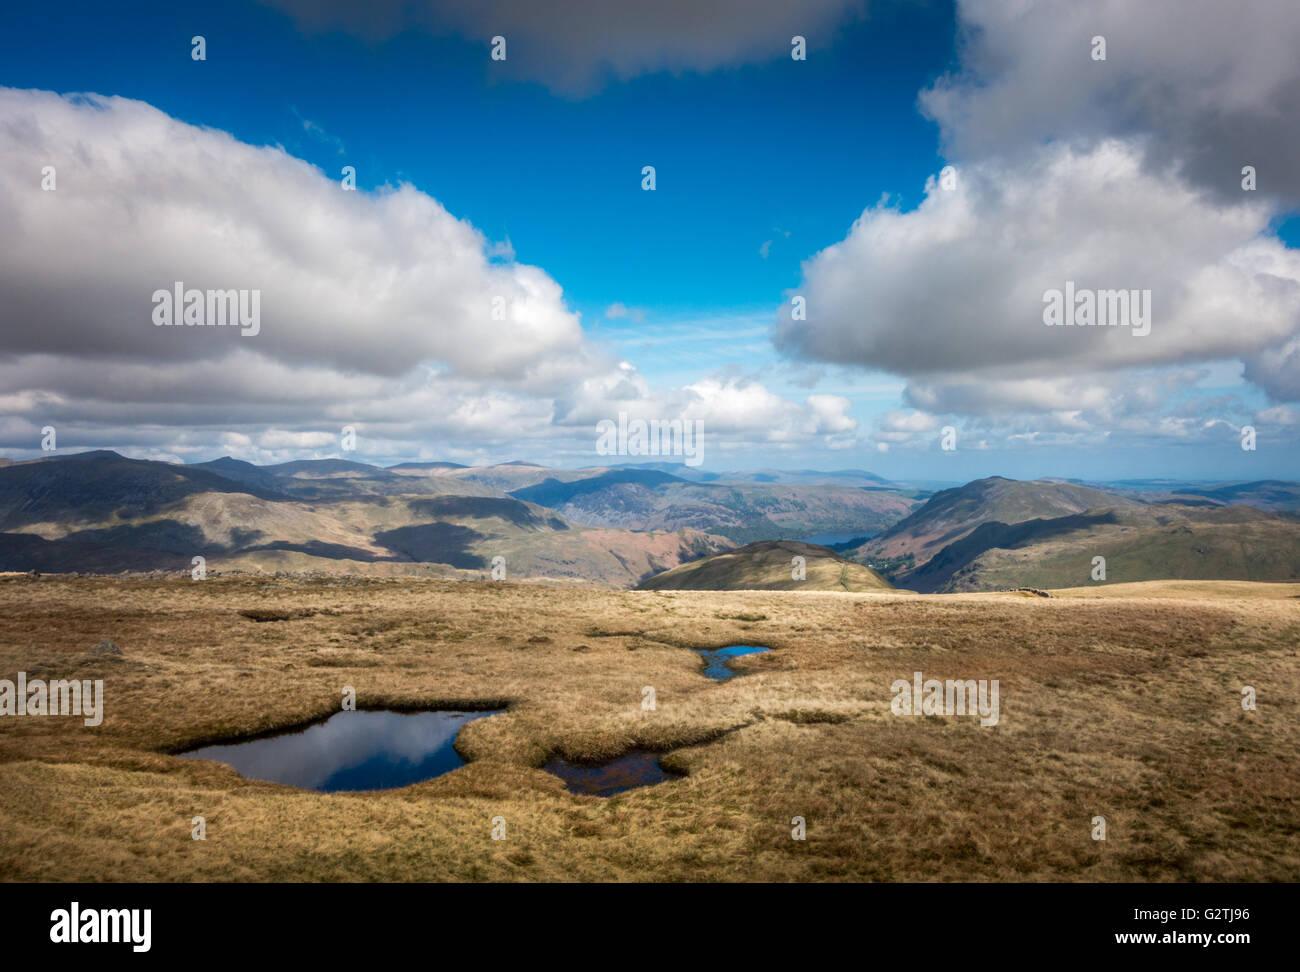 Summer views from Hartsop Dodd, The Lake District, Cumbria, UK - Stock Image